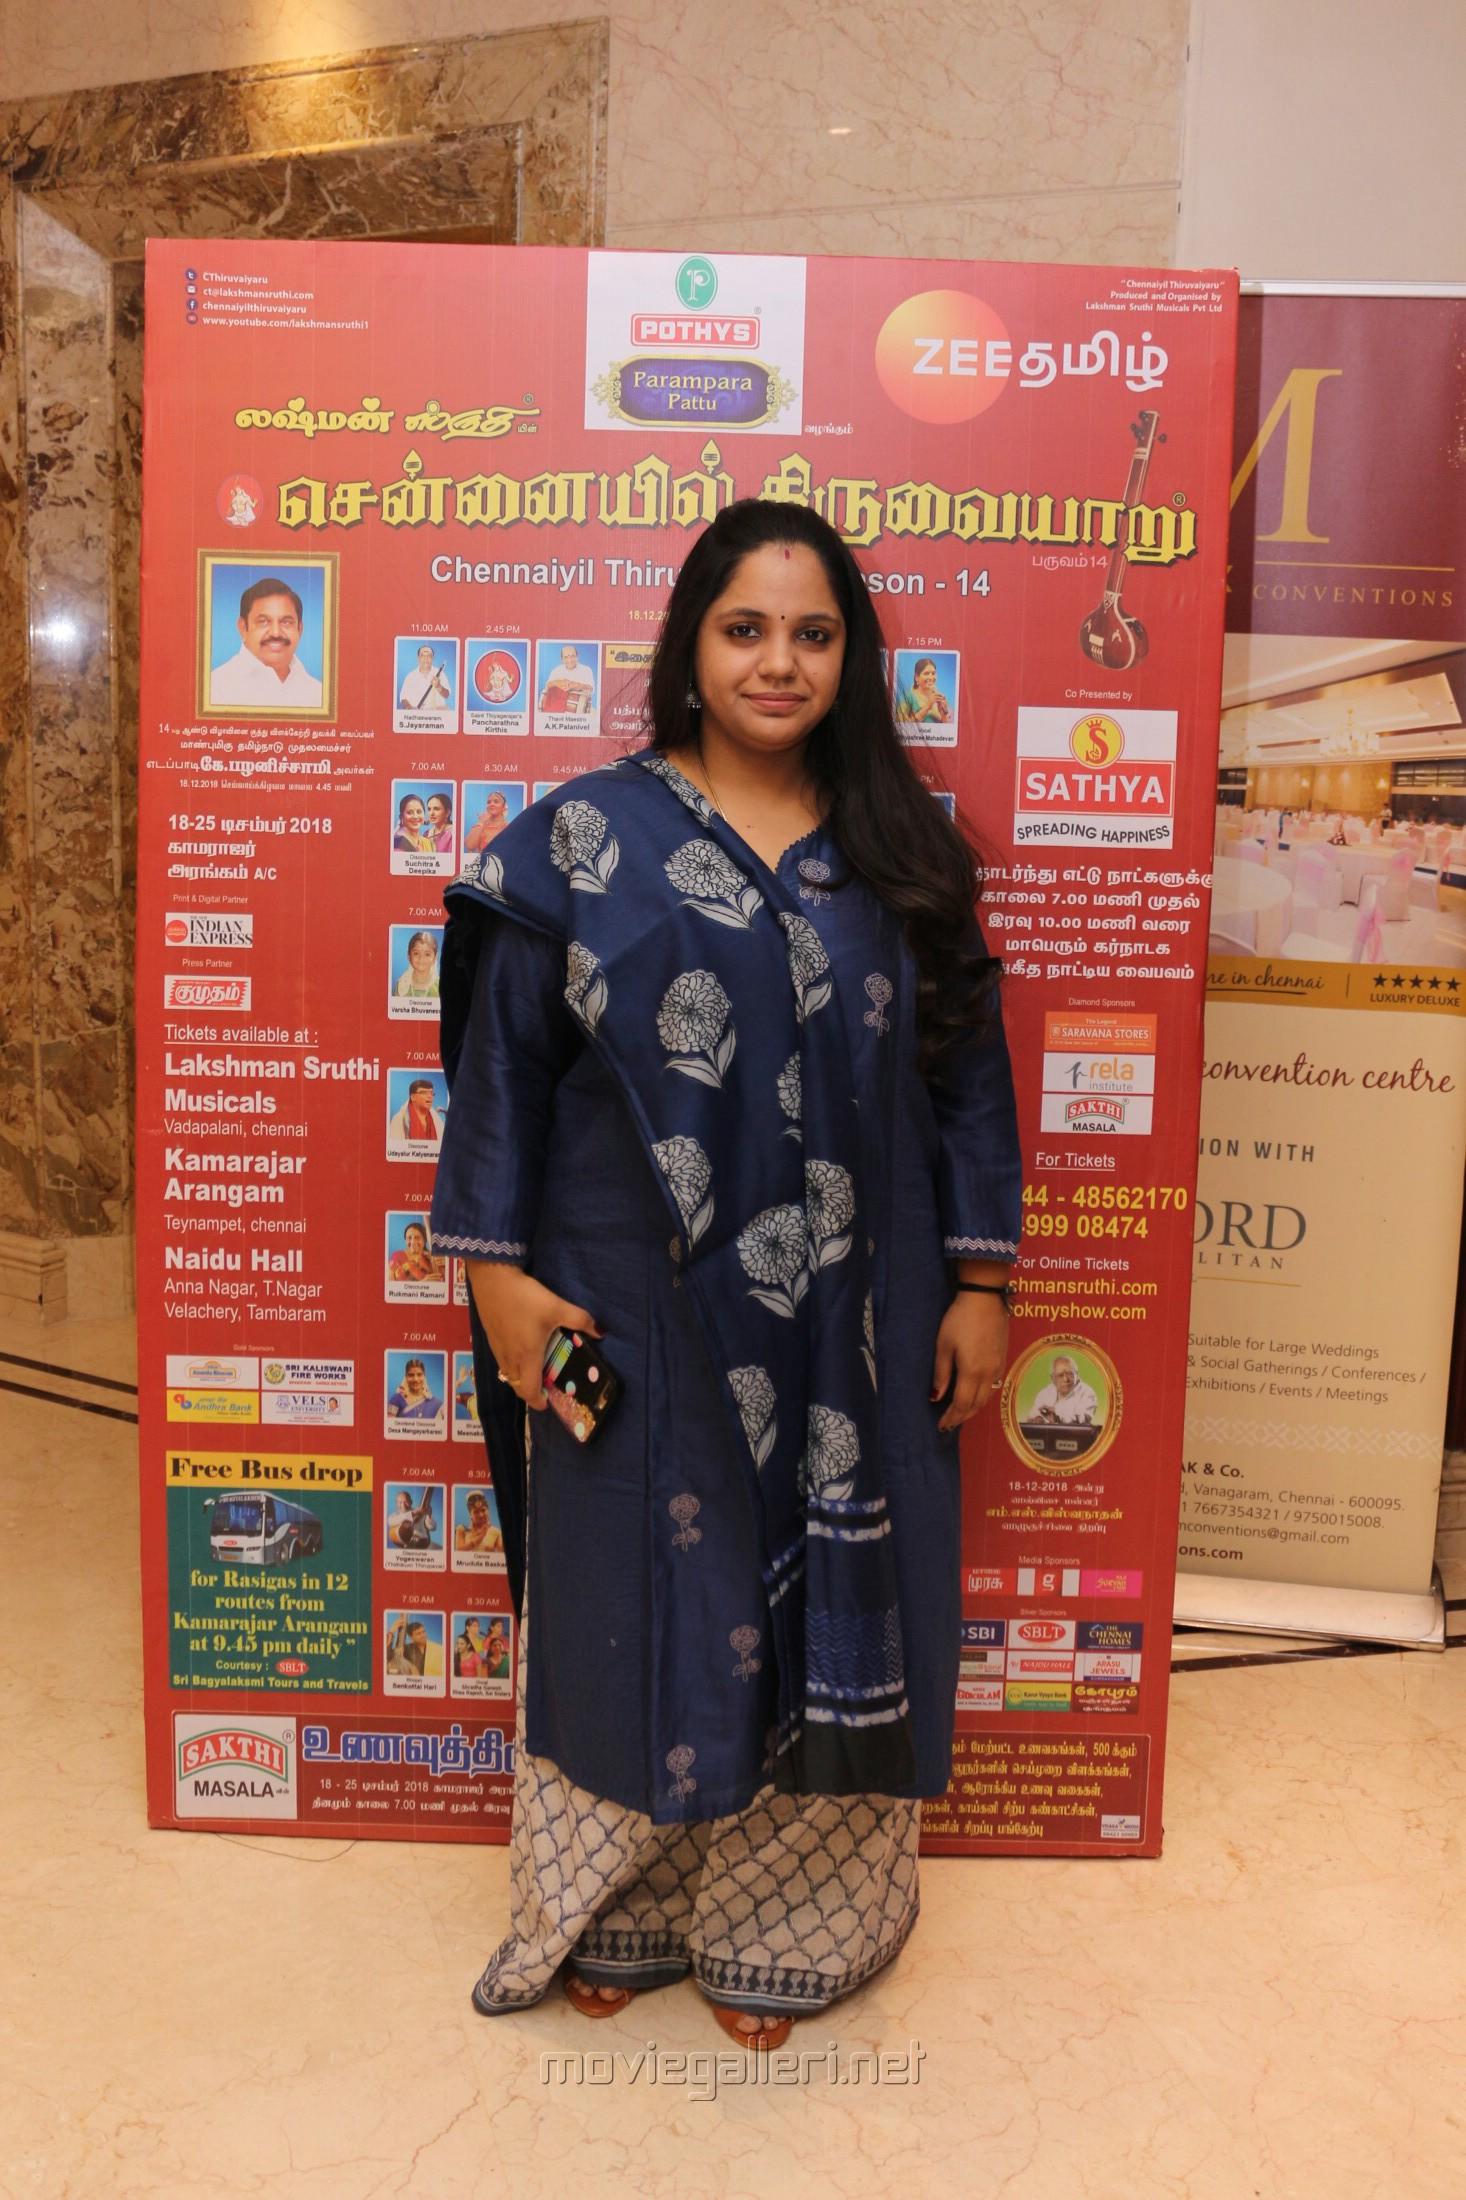 Singer Saindhavi @ Chennaiyil Thiruvaiyaru 2018 Season 14 Press Meet Stills